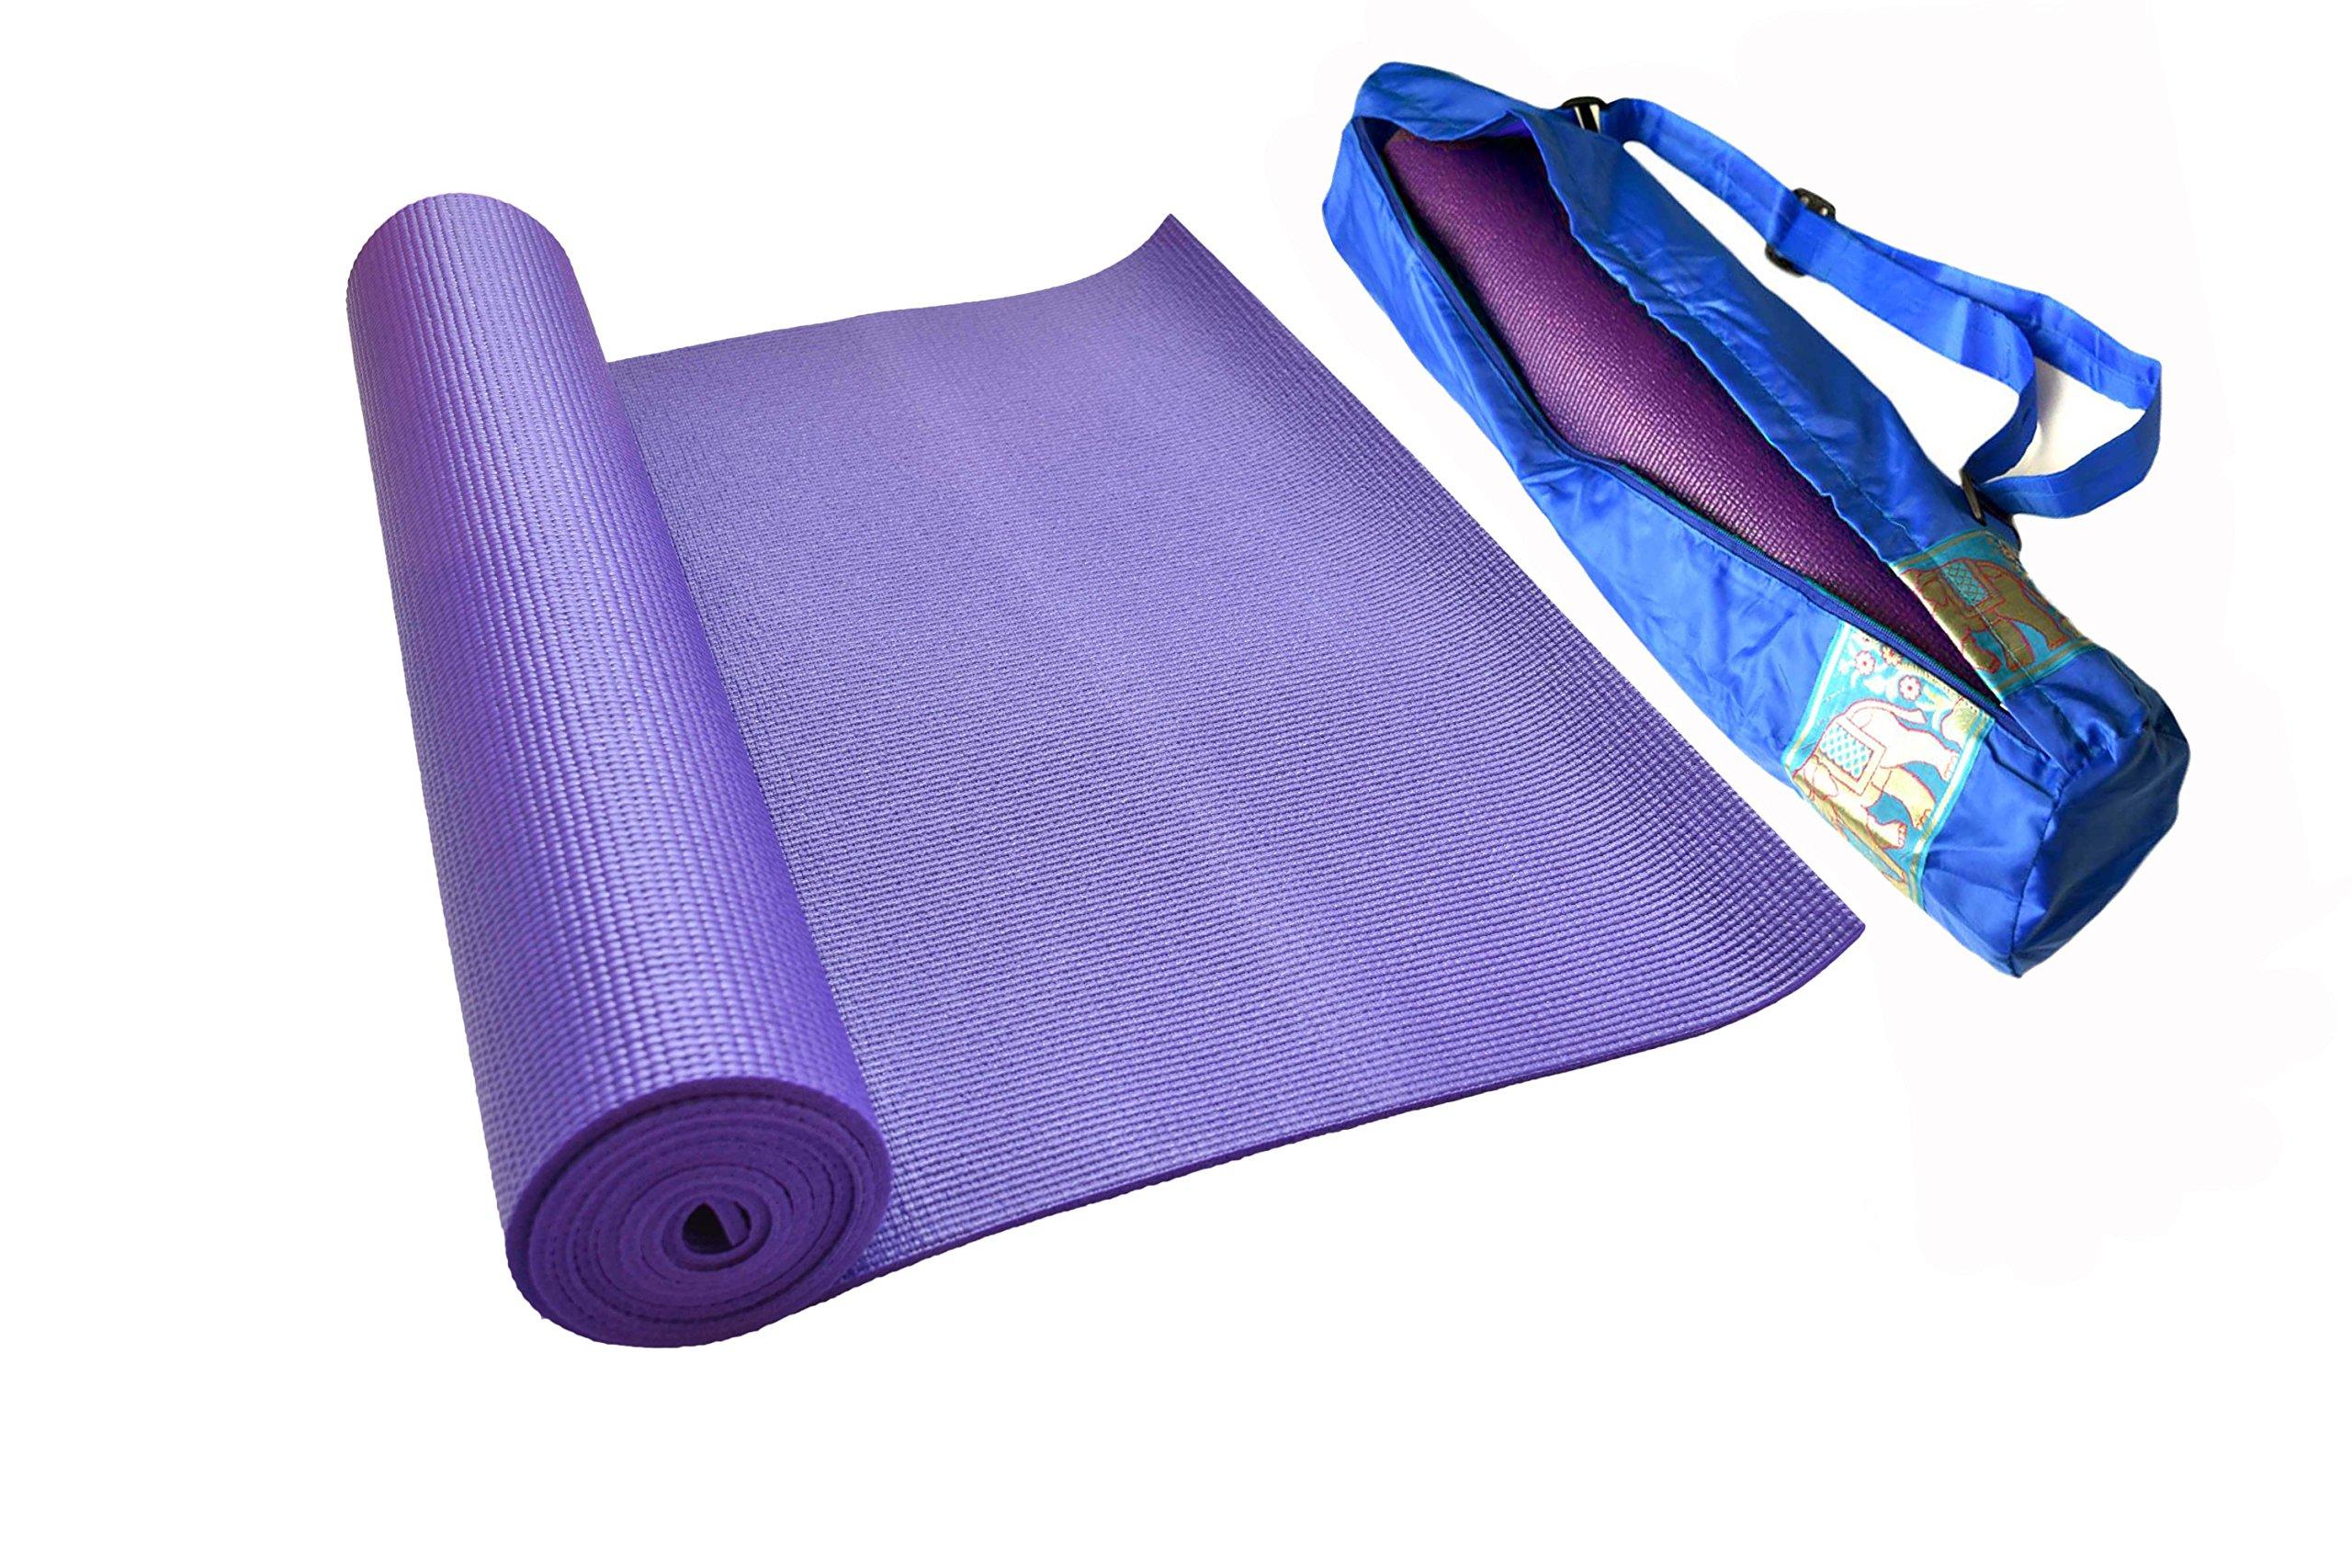 Yoga United Yoga mat and Bag Pack